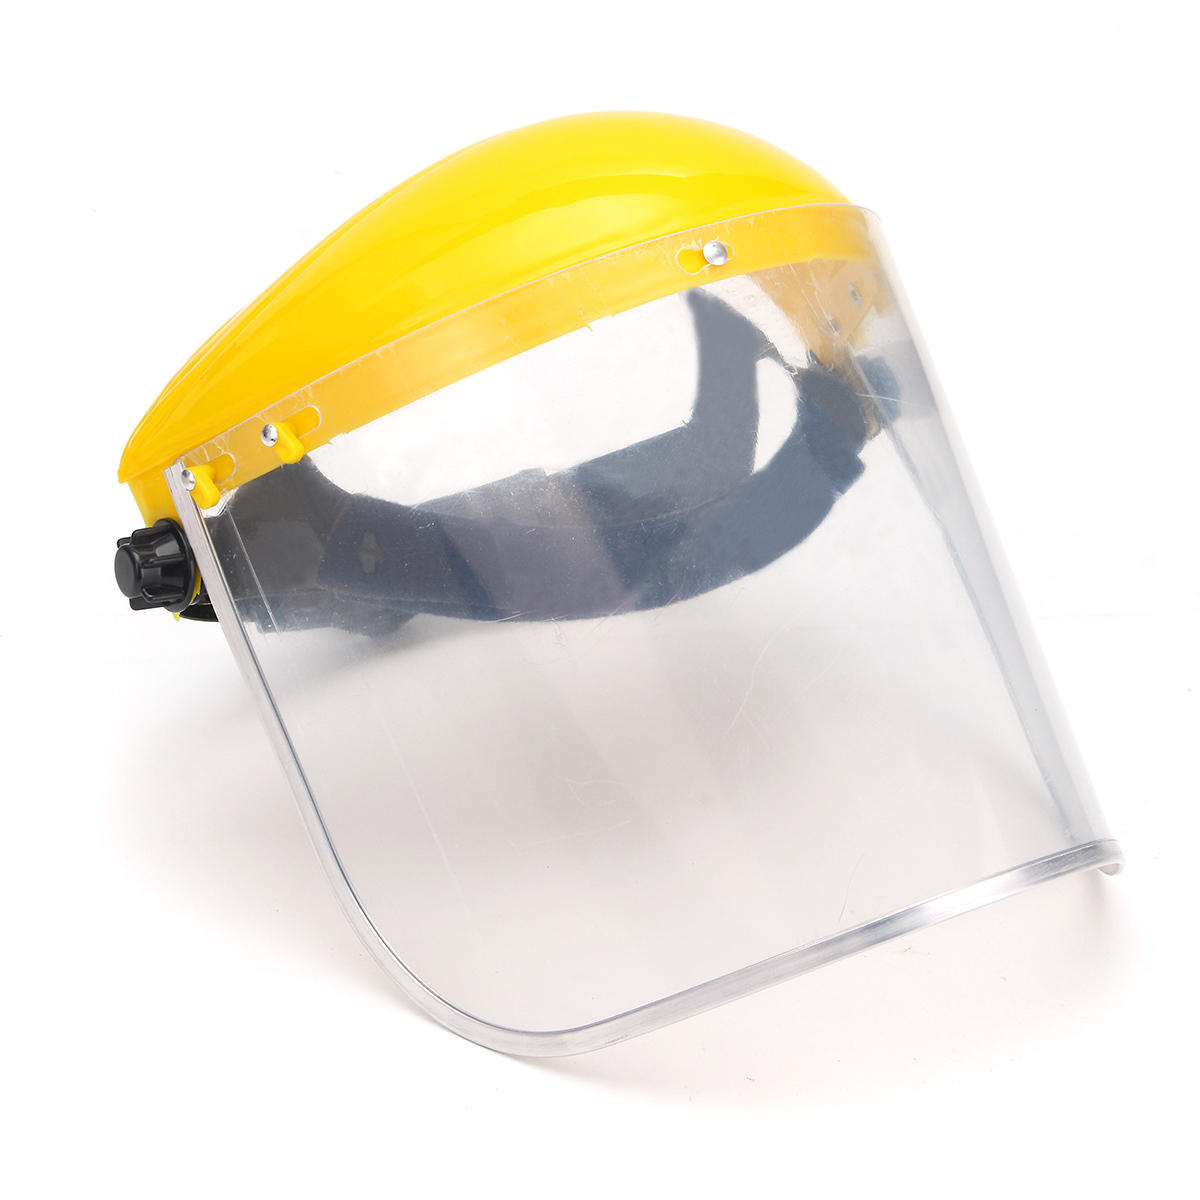 Clear Mesh Full Visor Flip Up Face Shield Screen Safety Mask Eye Protector Helmet Yellow